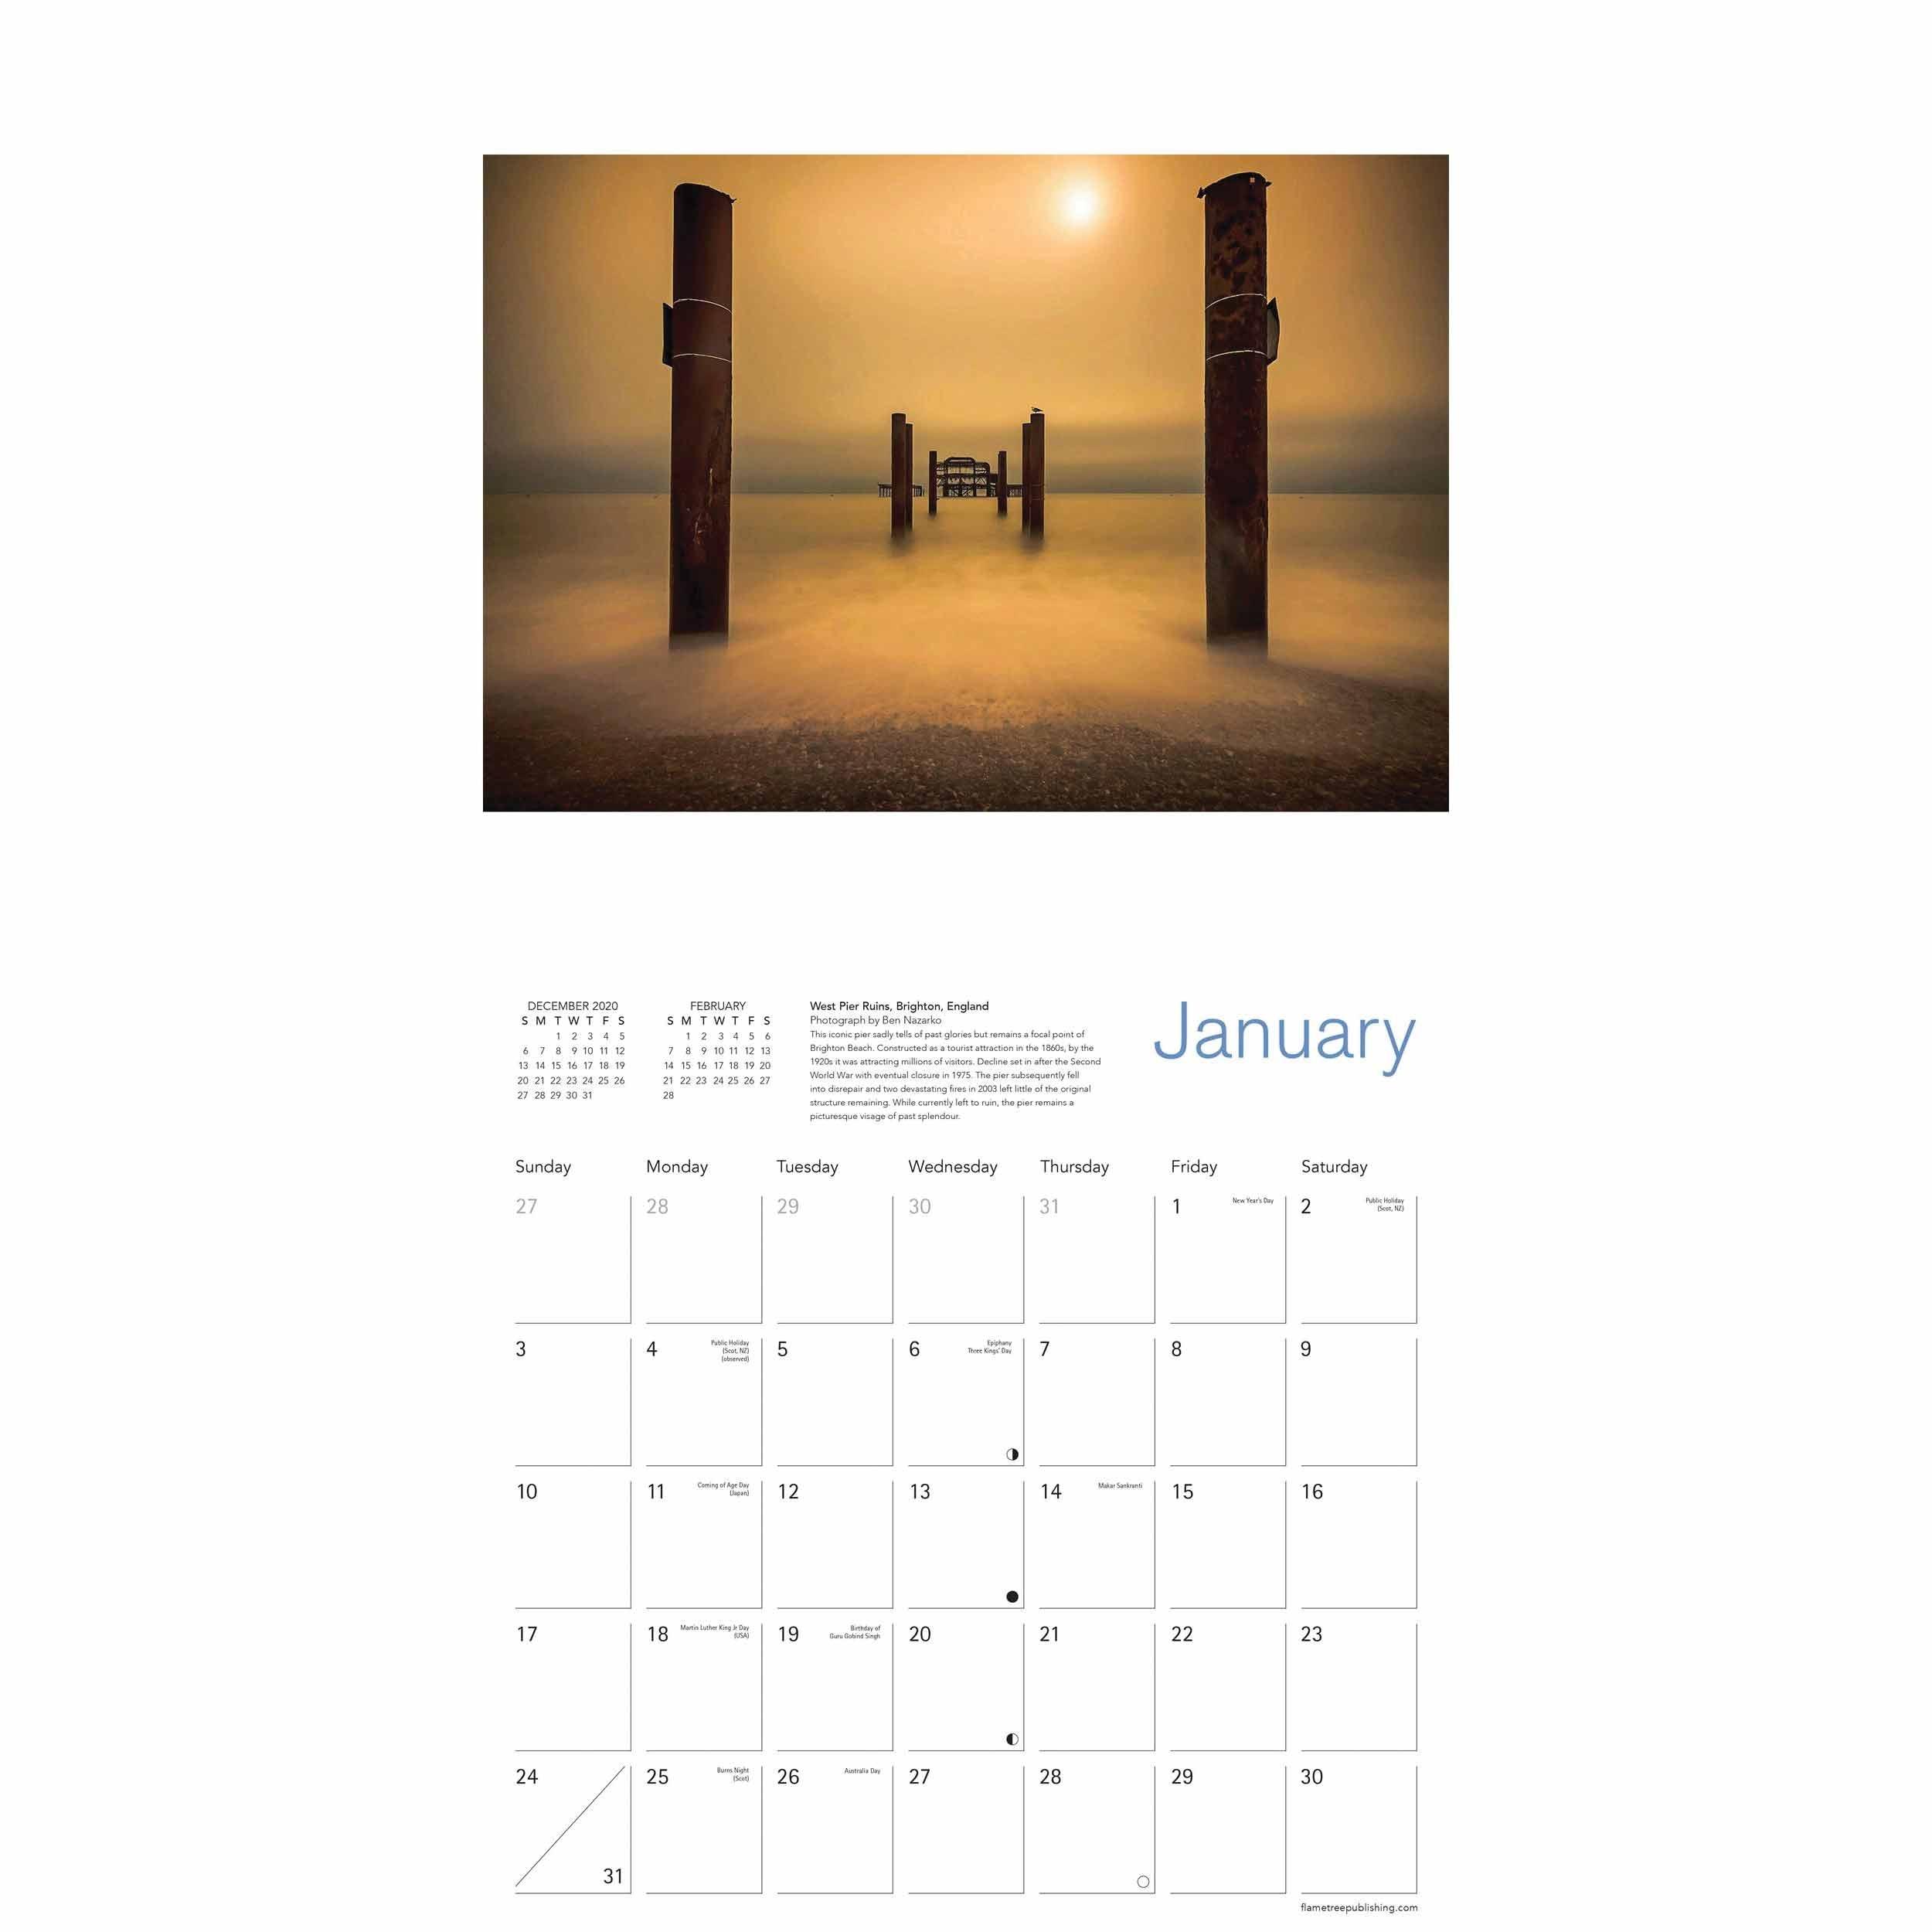 Historic Photographer Of The Year Calendar 2021 At Calendar Club